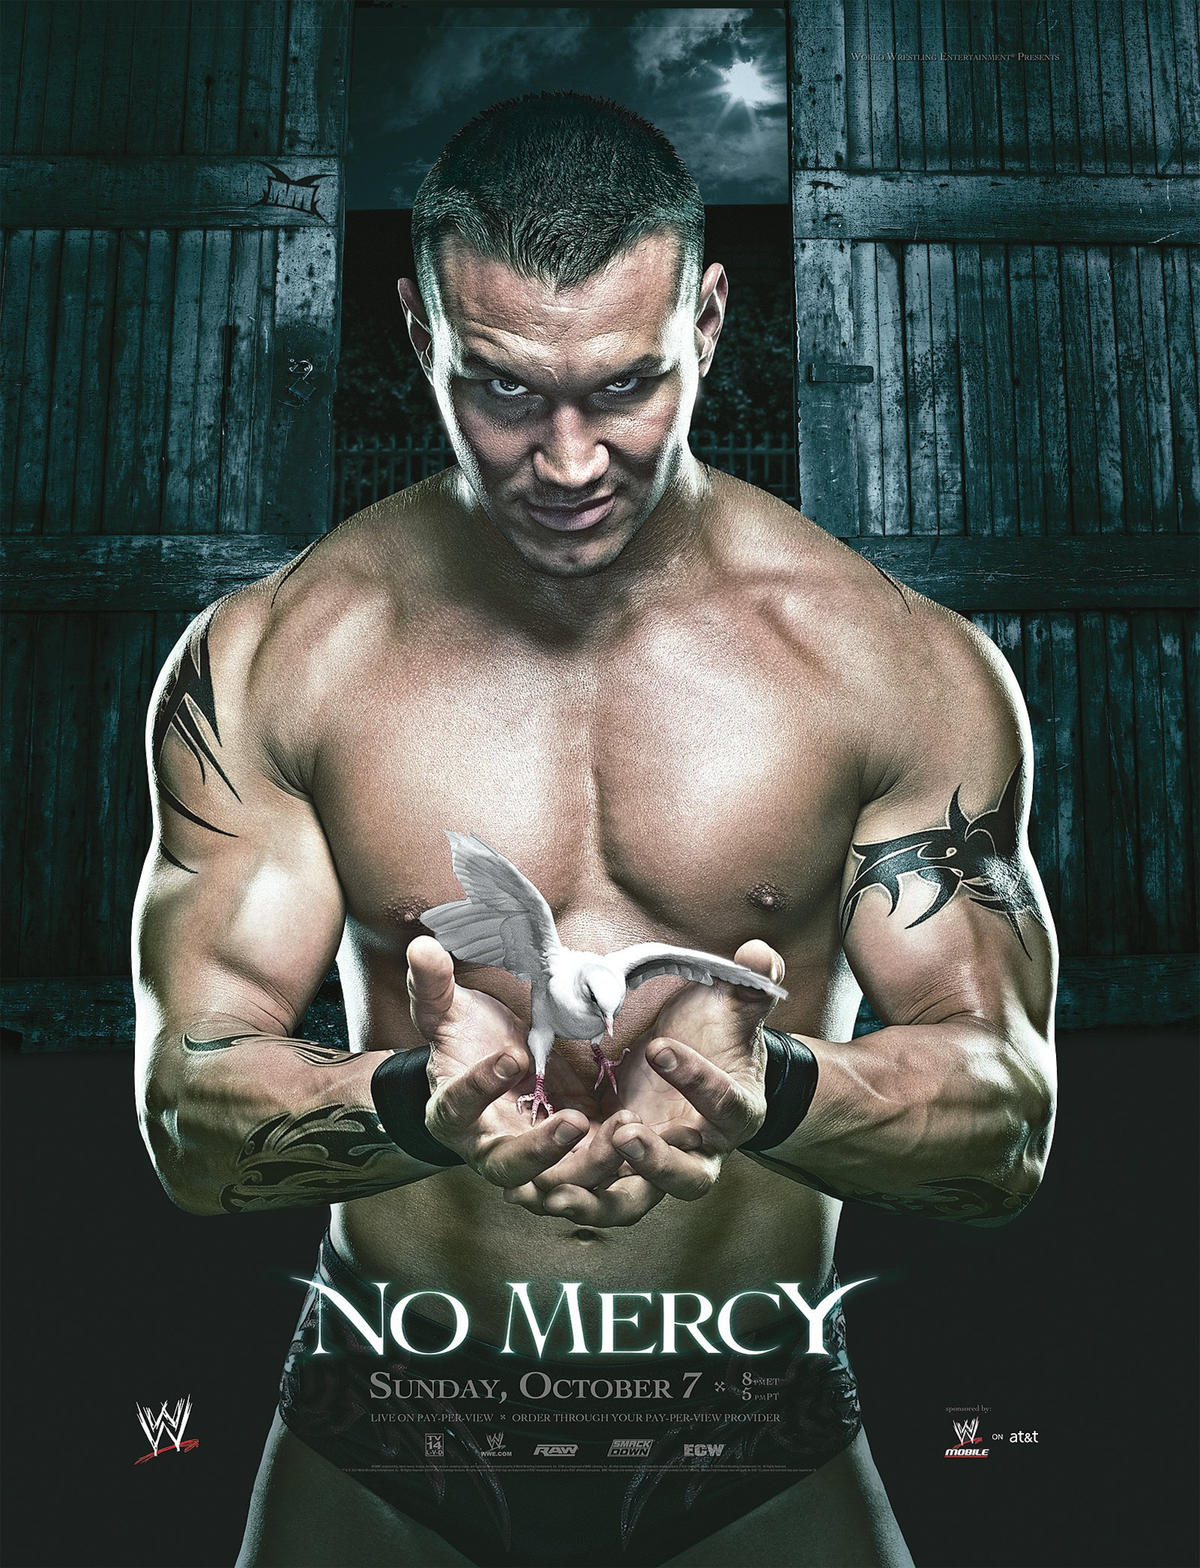 002_WWE_NM_8_27_New--a3d5b1f29b4230e2eef